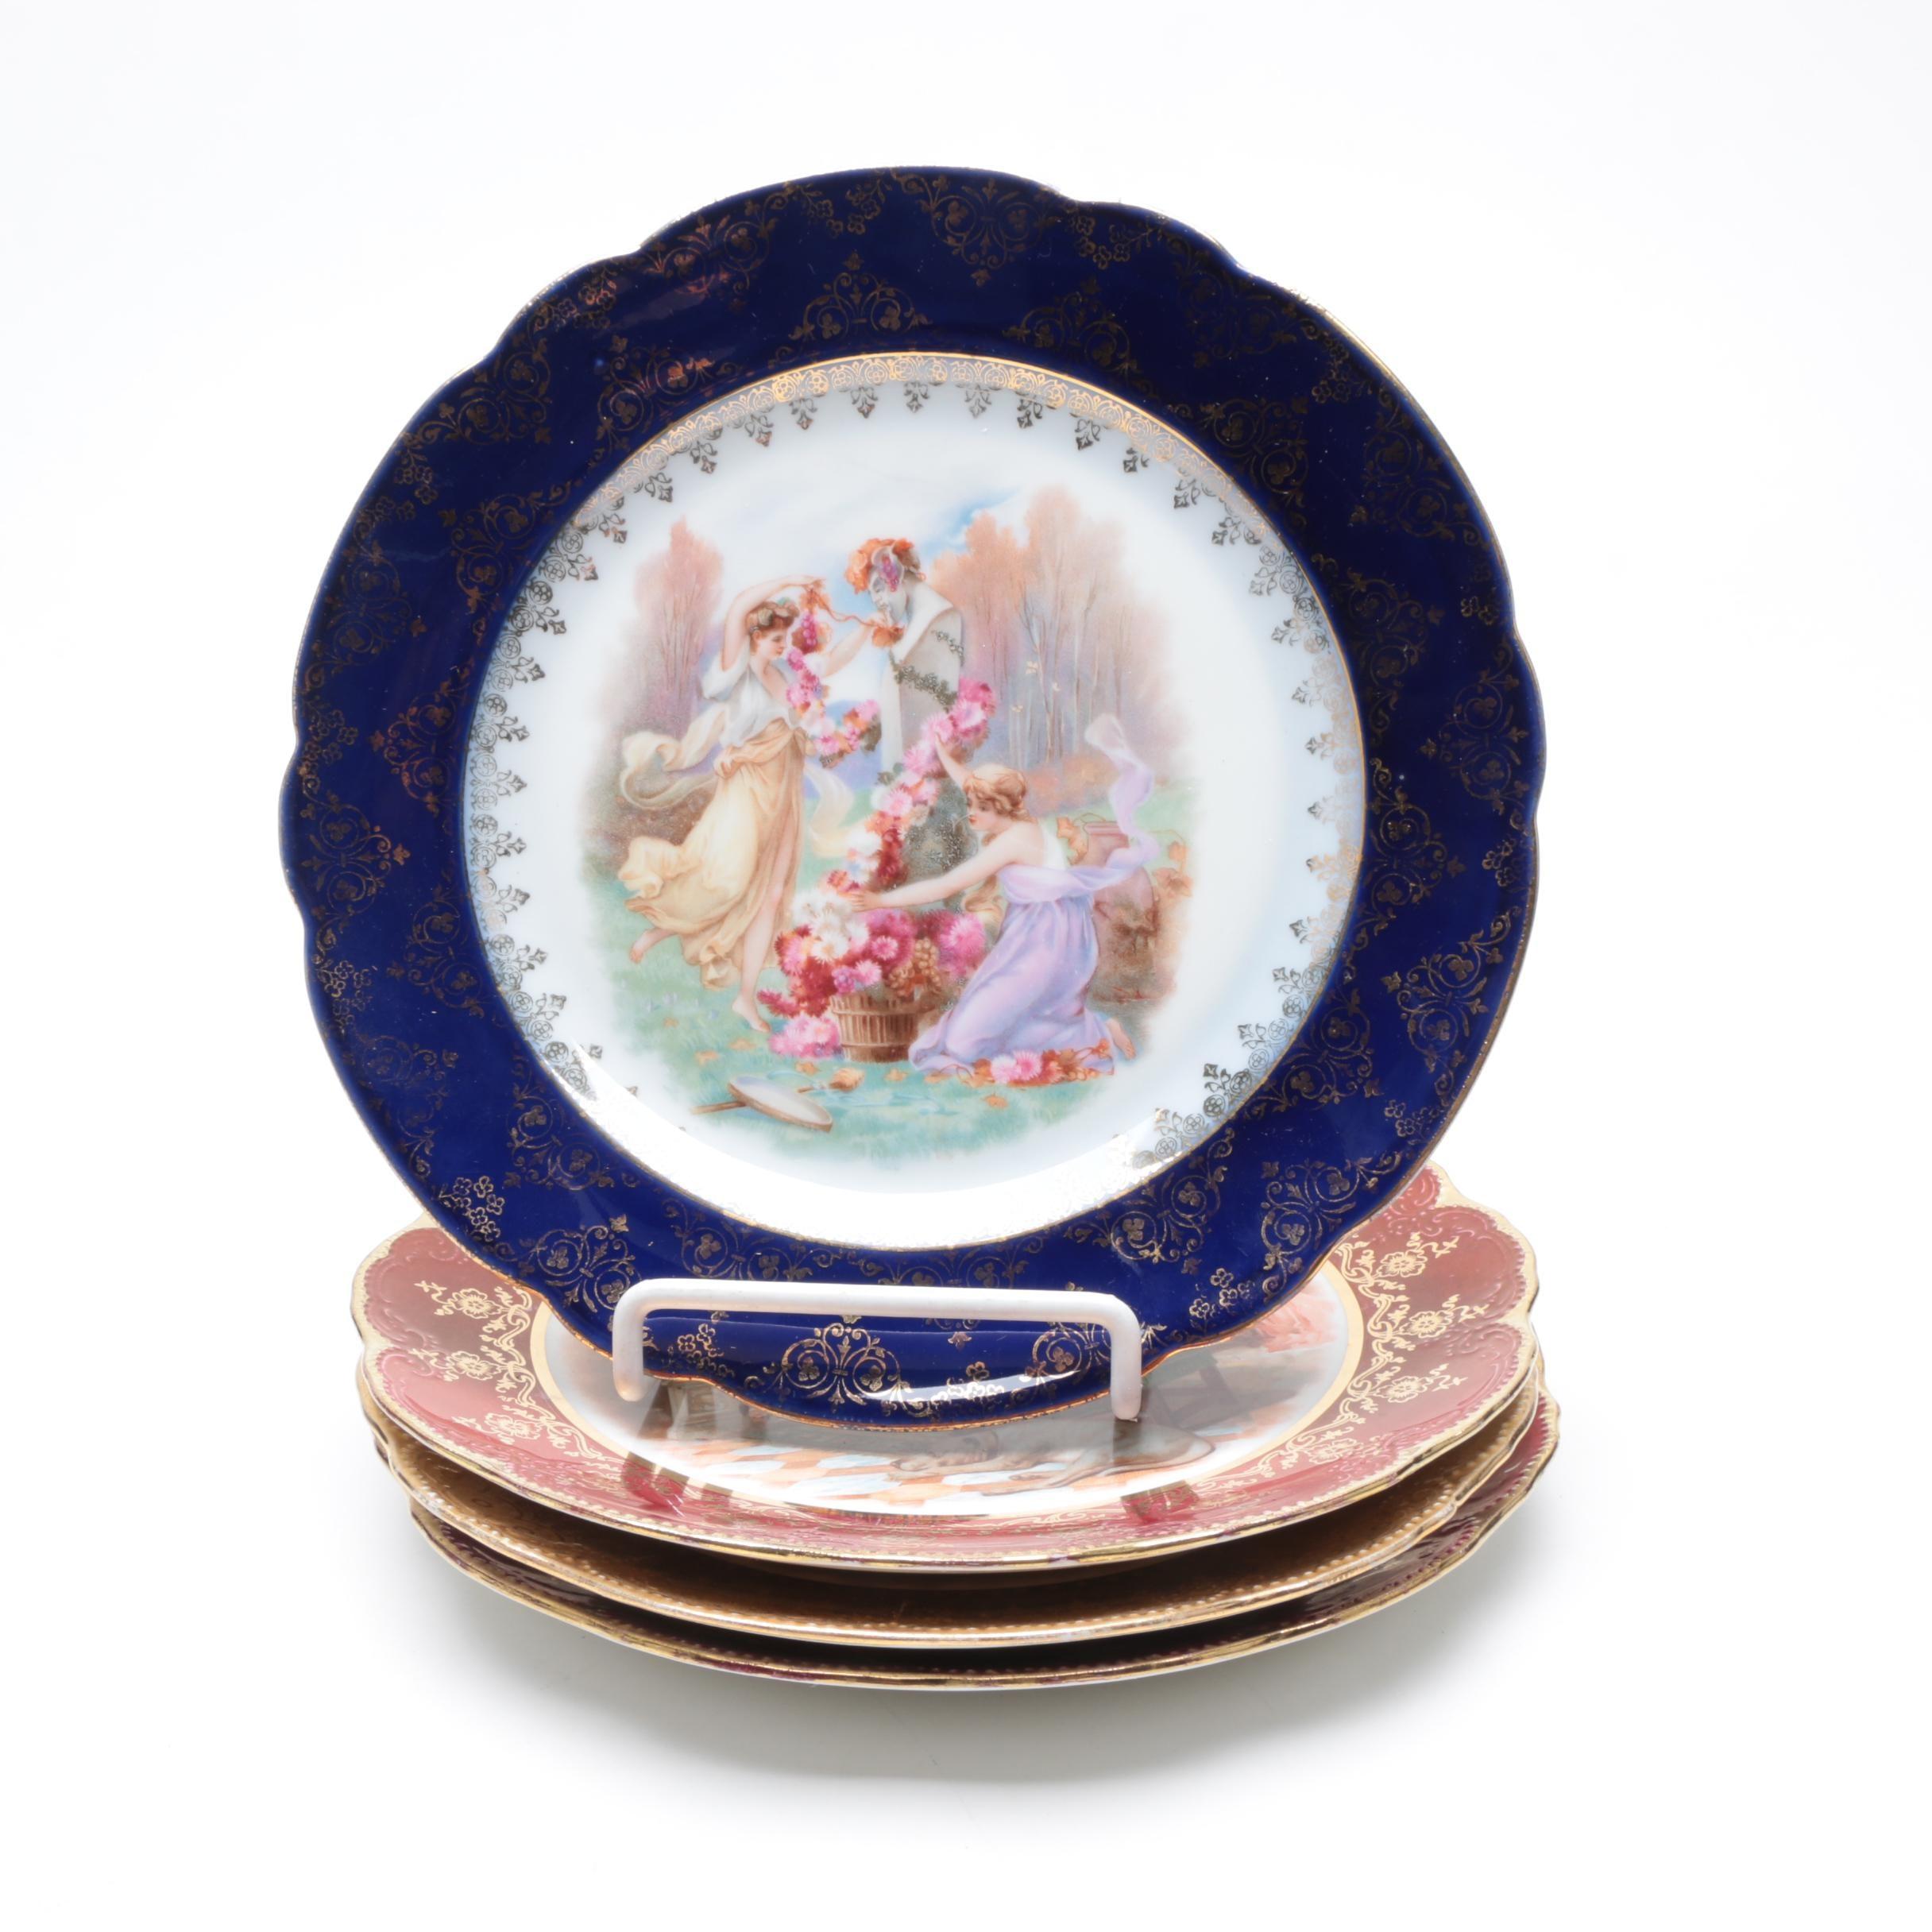 Antique Knights Templar Semi-Vitreous Porcelain Plates ...  sc 1 st  EBTH.com & Antique Knights Templar Semi-Vitreous Porcelain Plates : EBTH